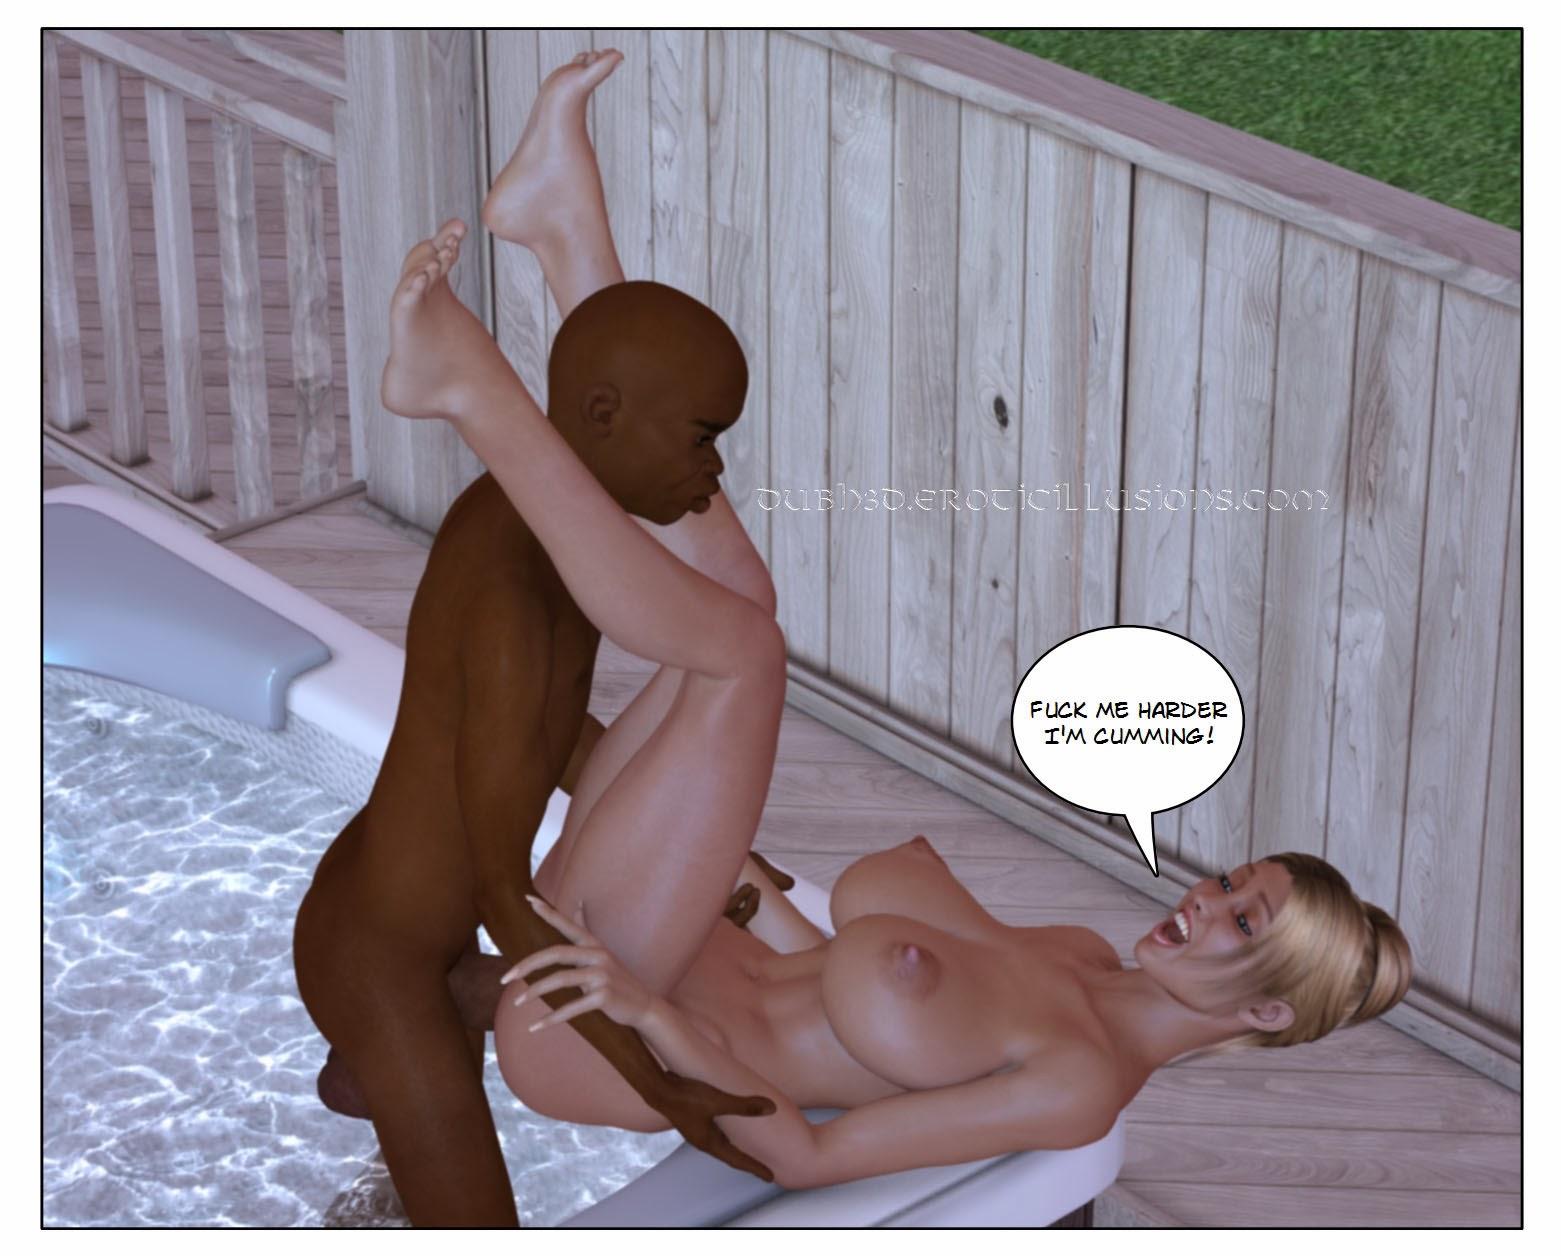 Midget interracial gangbang